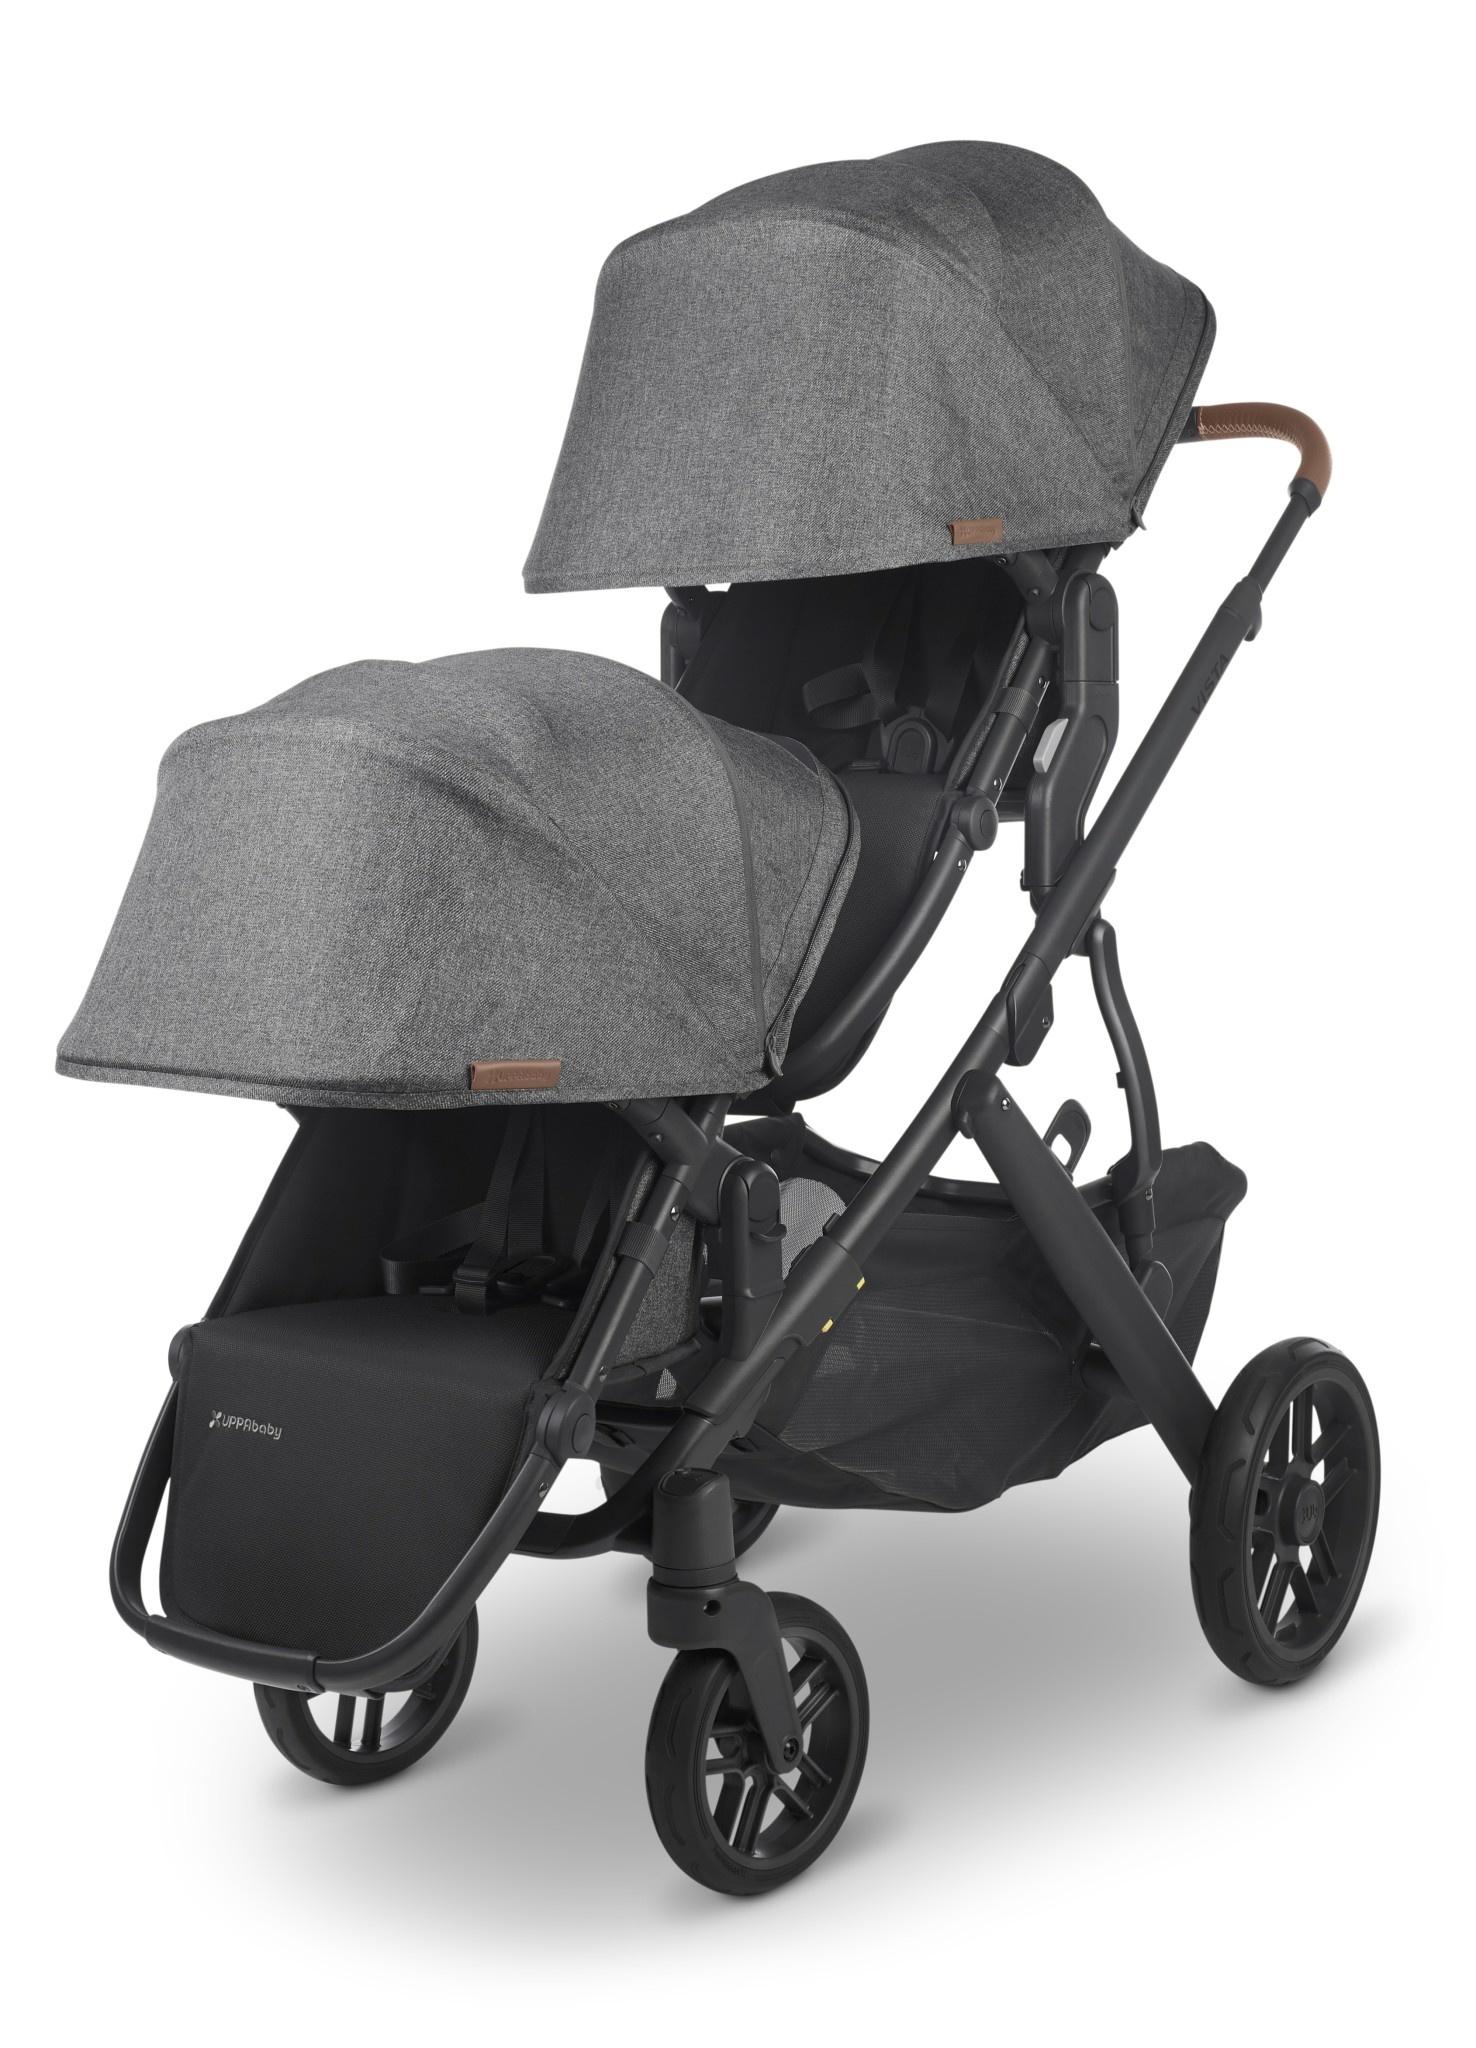 UPPAbaby UPPABaby V2 Vista Stroller